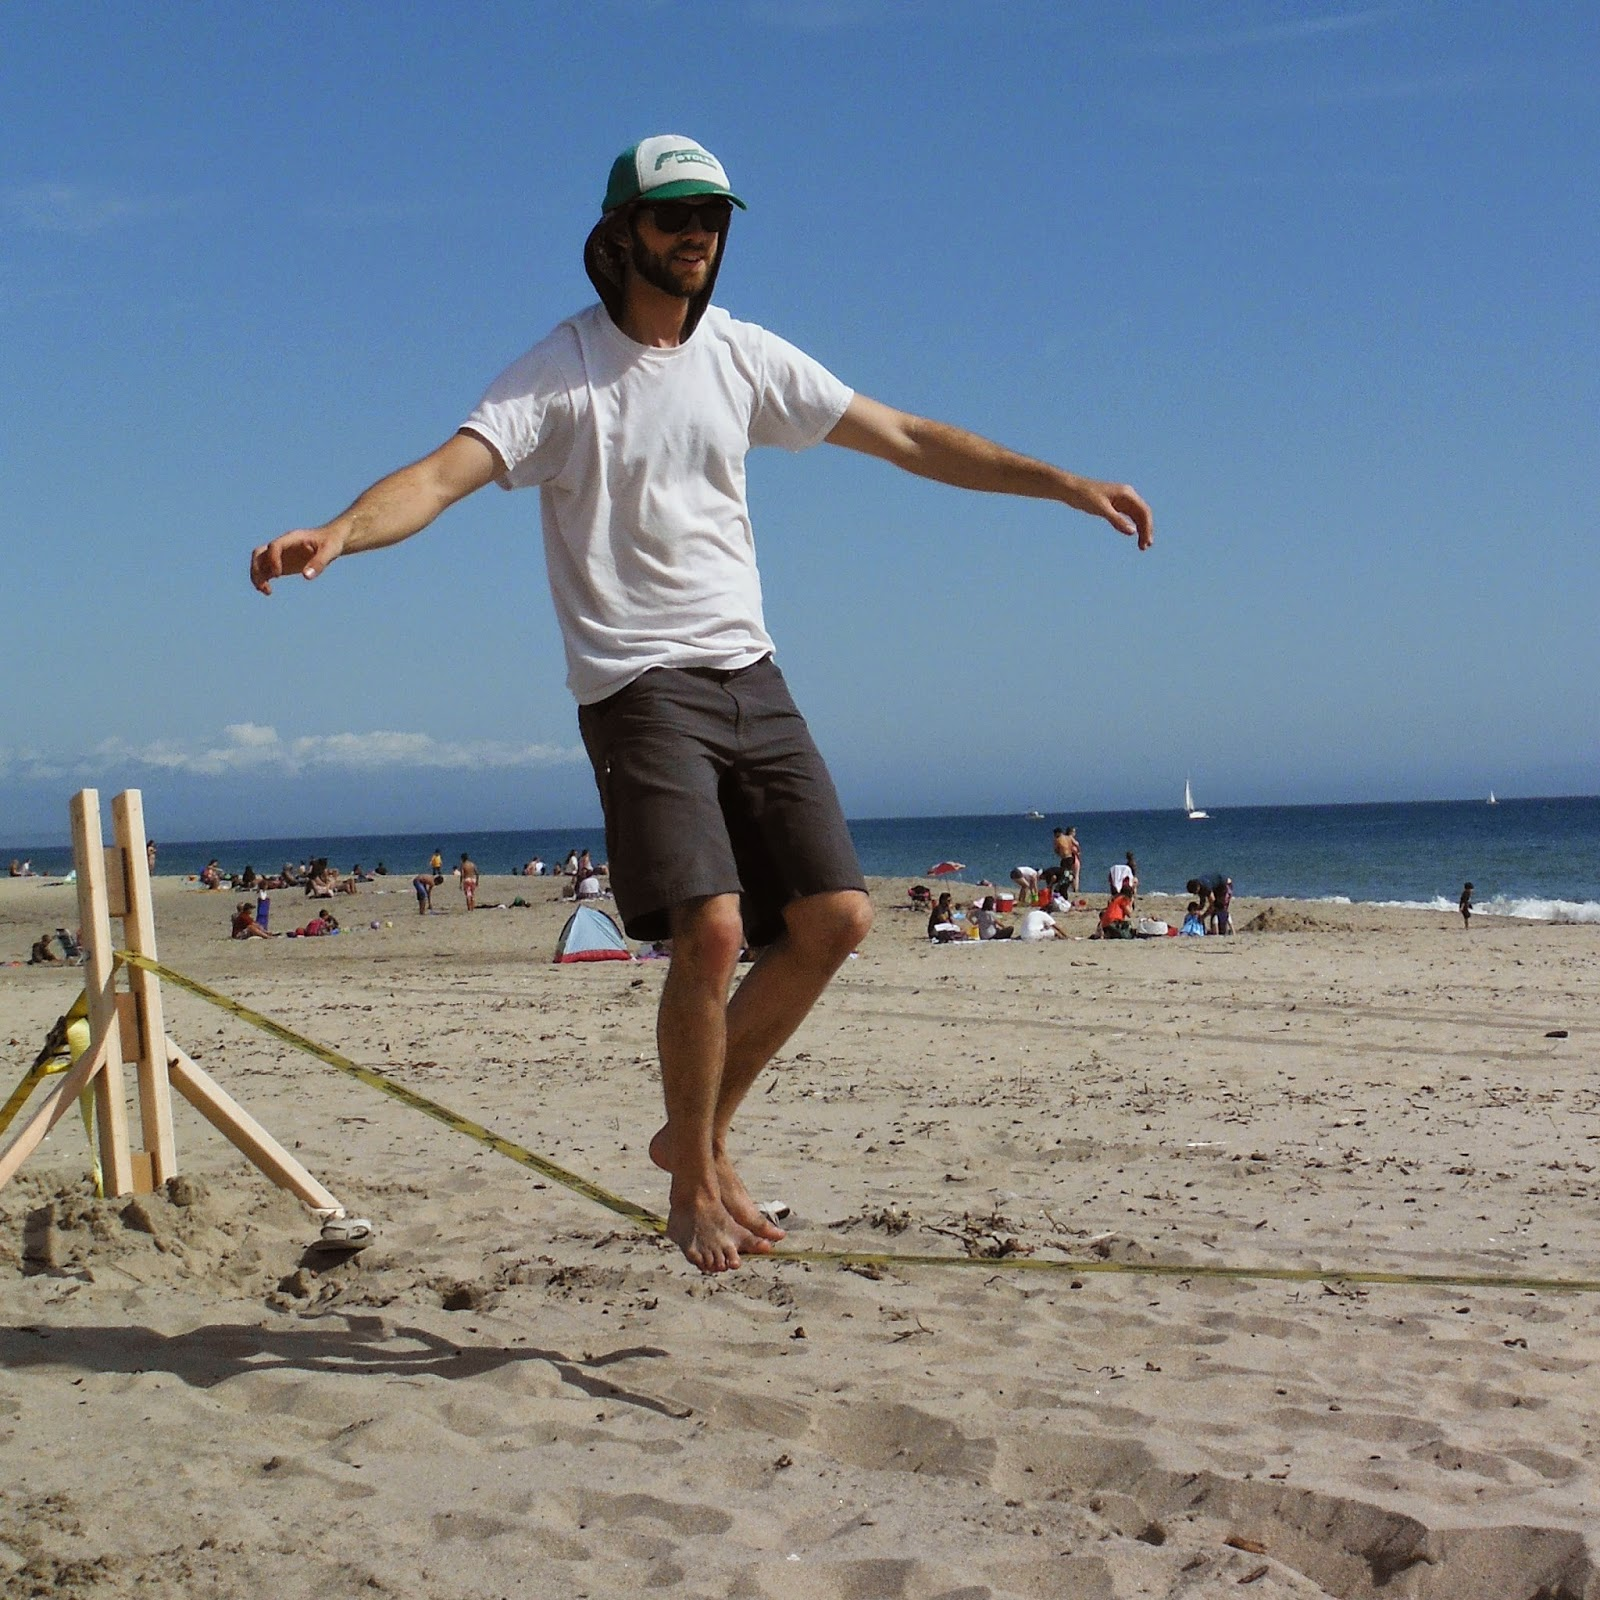 Anarchist Climber: Building a Beach Slackline A-Frame